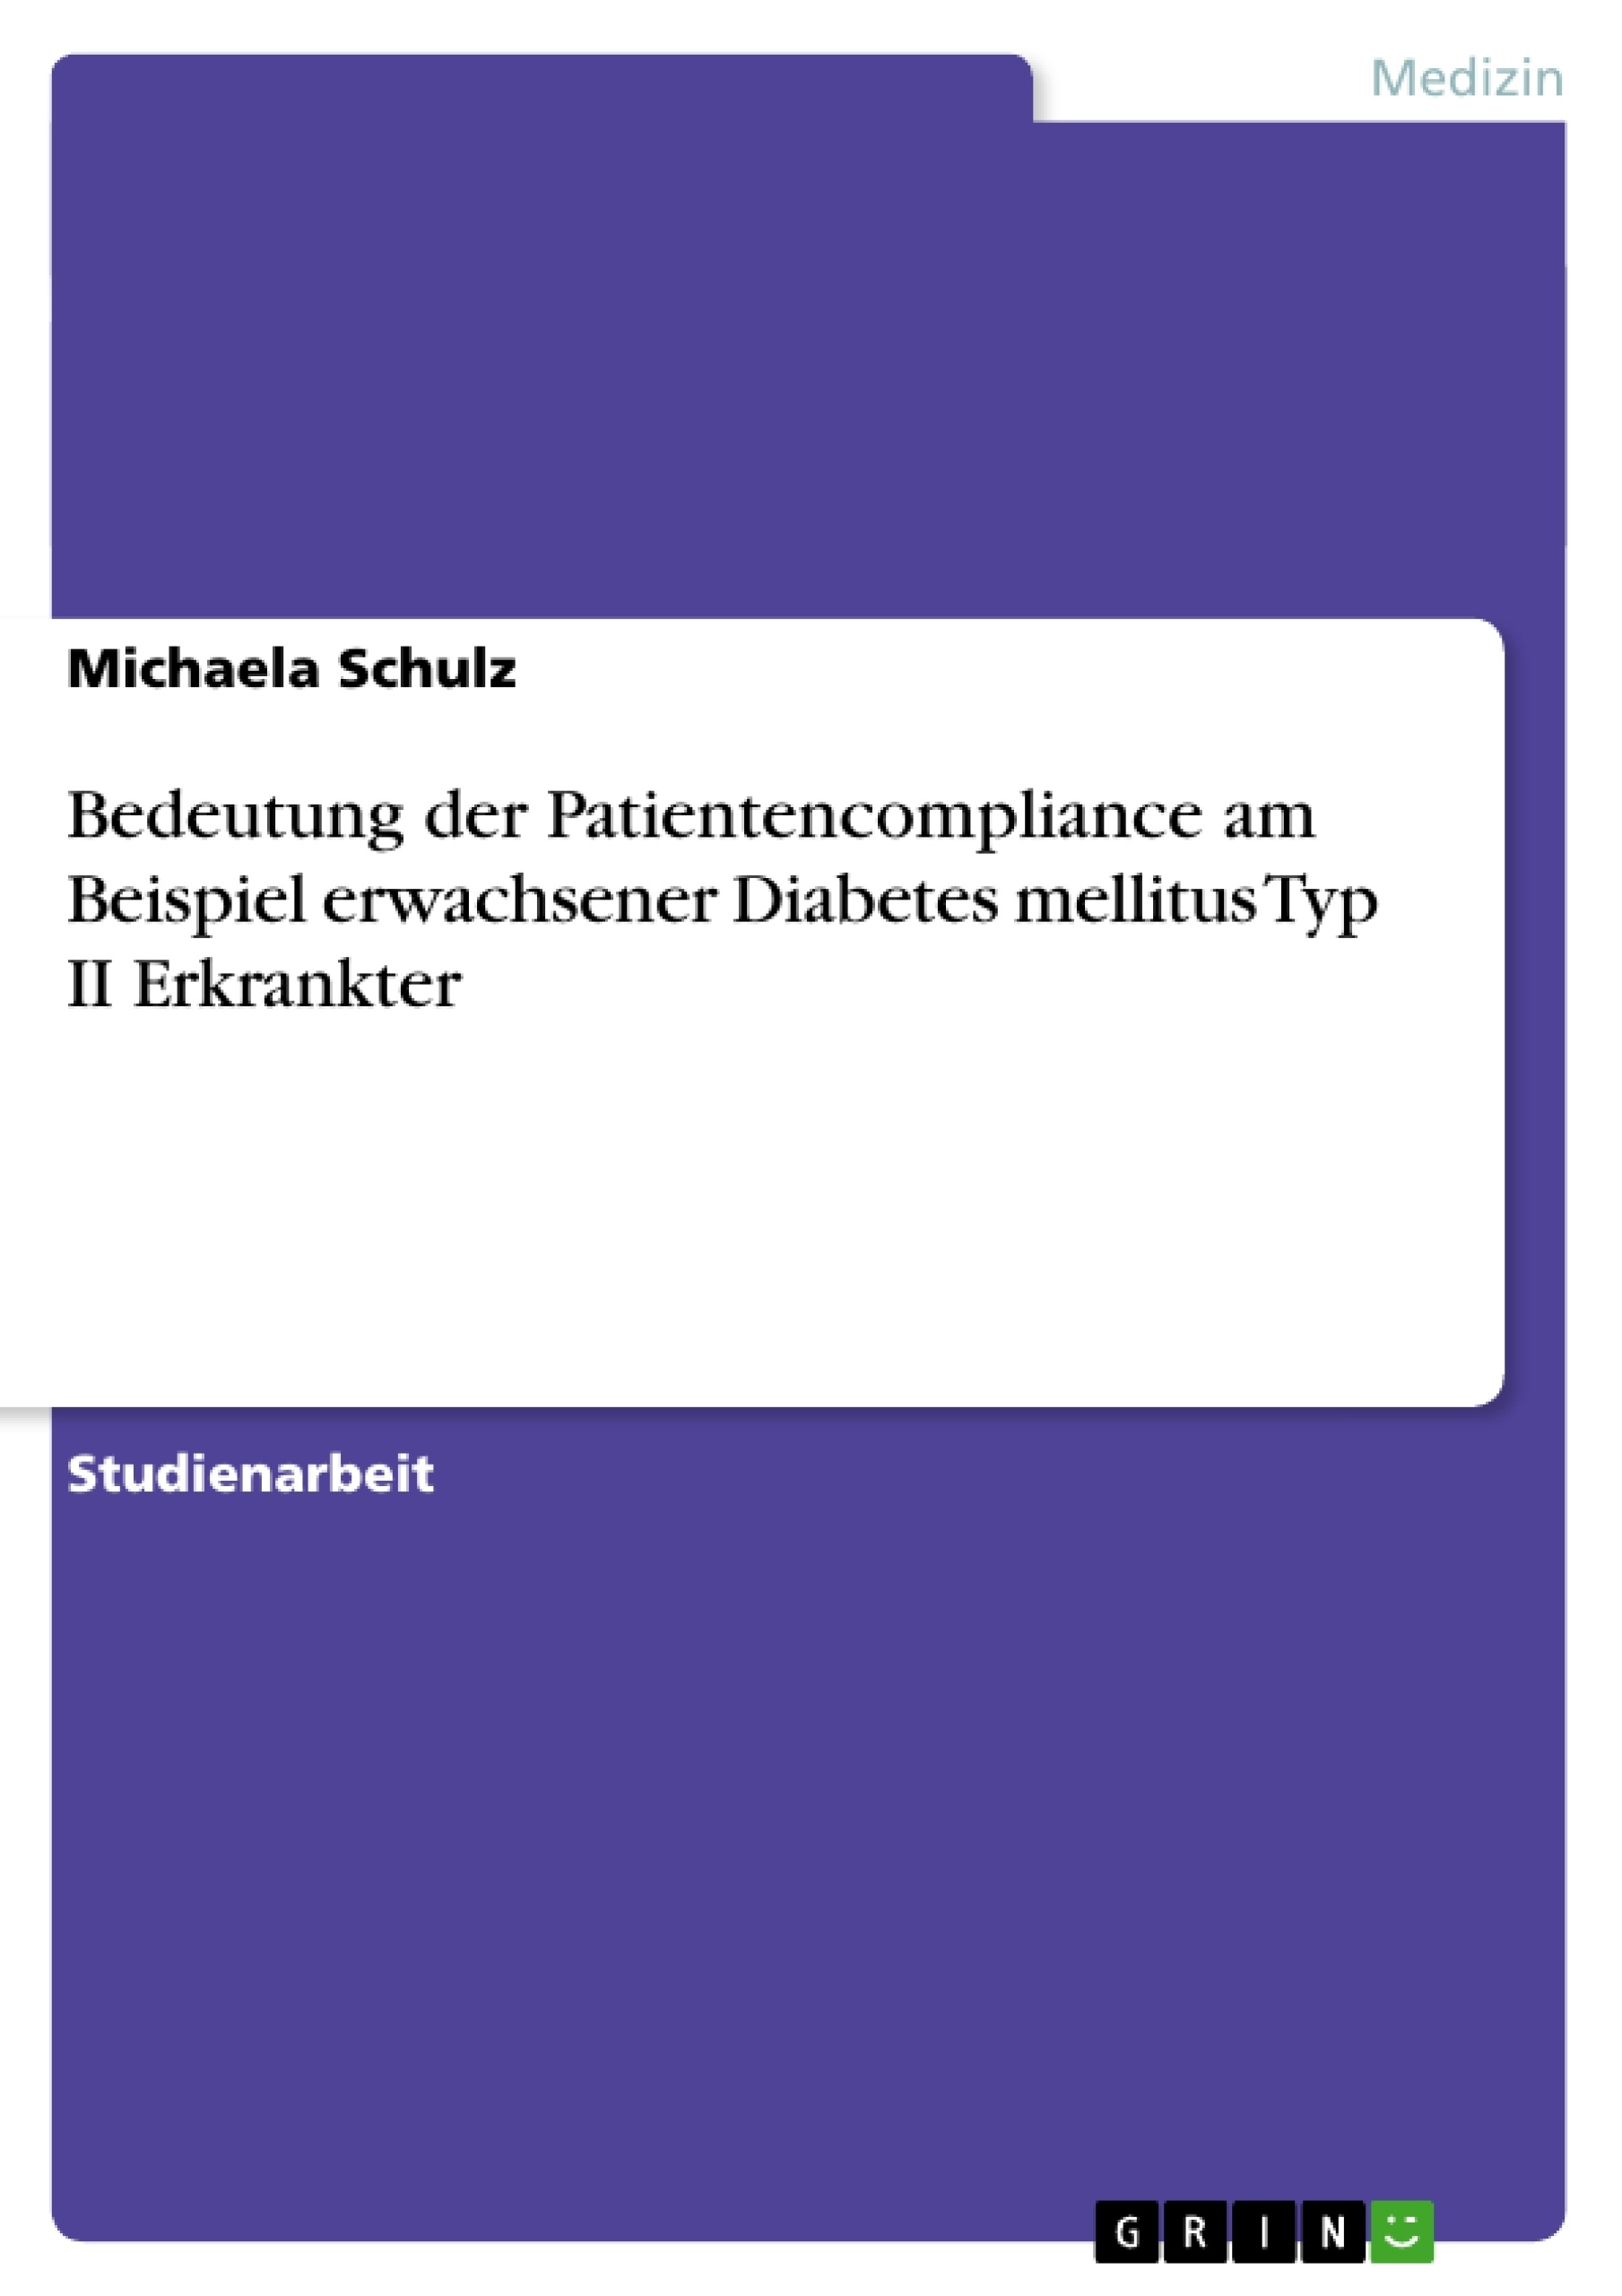 Titel: Bedeutung der Patientencompliance am Beispiel erwachsener Diabetes mellitus Typ II Erkrankter